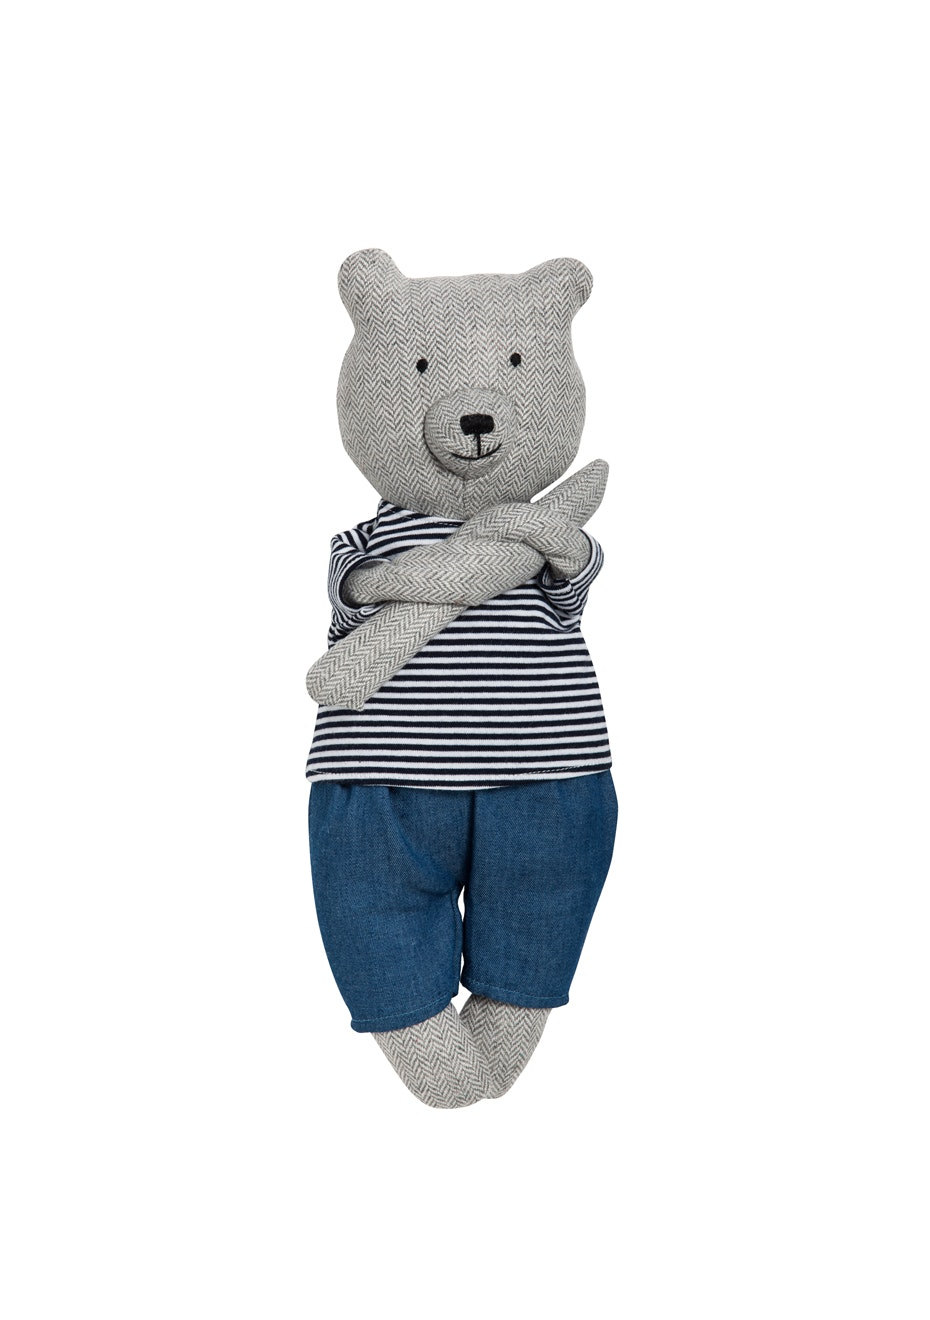 Lily & George - Milo Bear Toy